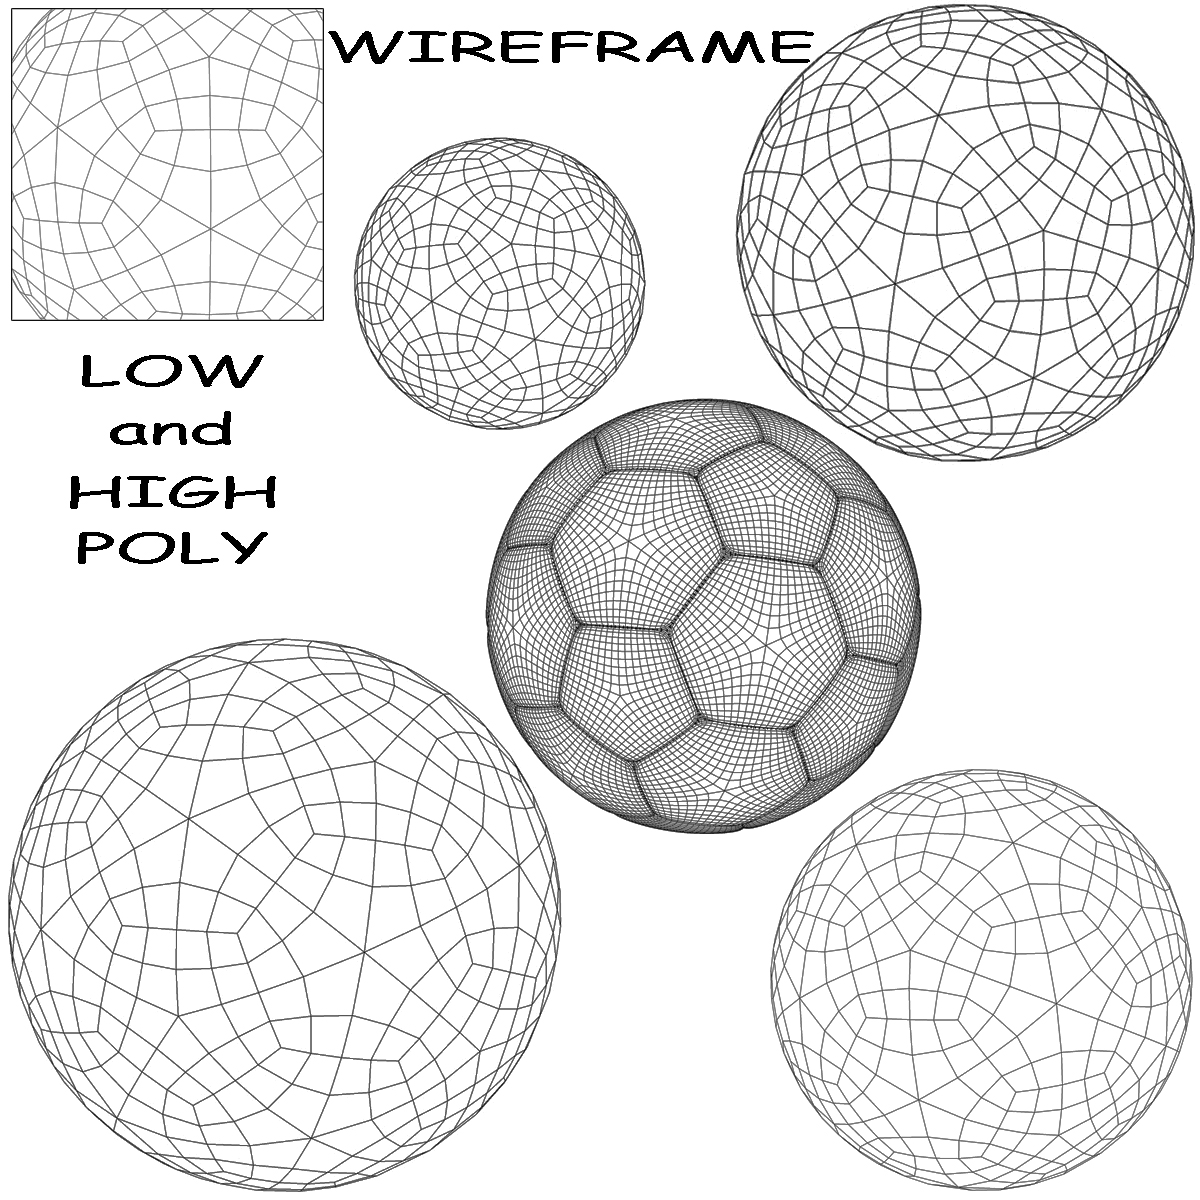 soccerball дотроо 3d загвар 3ds max fbx c4d м mb obj 205141